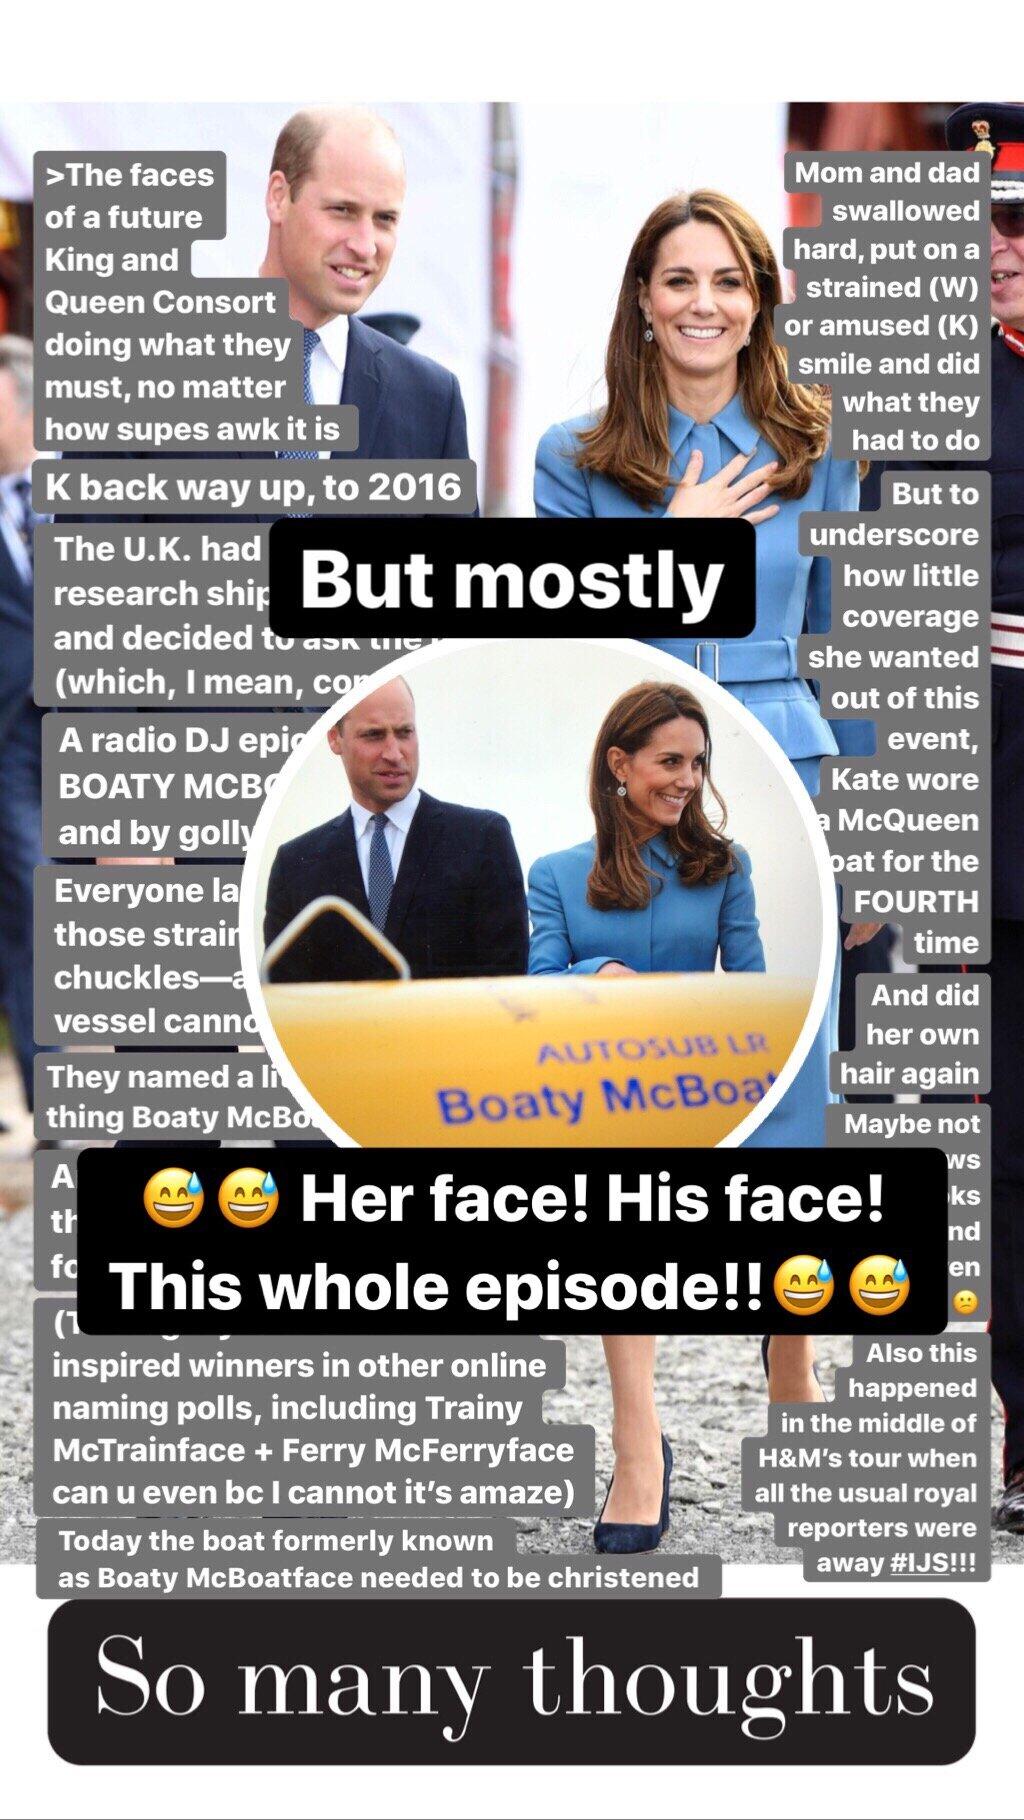 Kate_BoatyMcBoatface_3.JPG